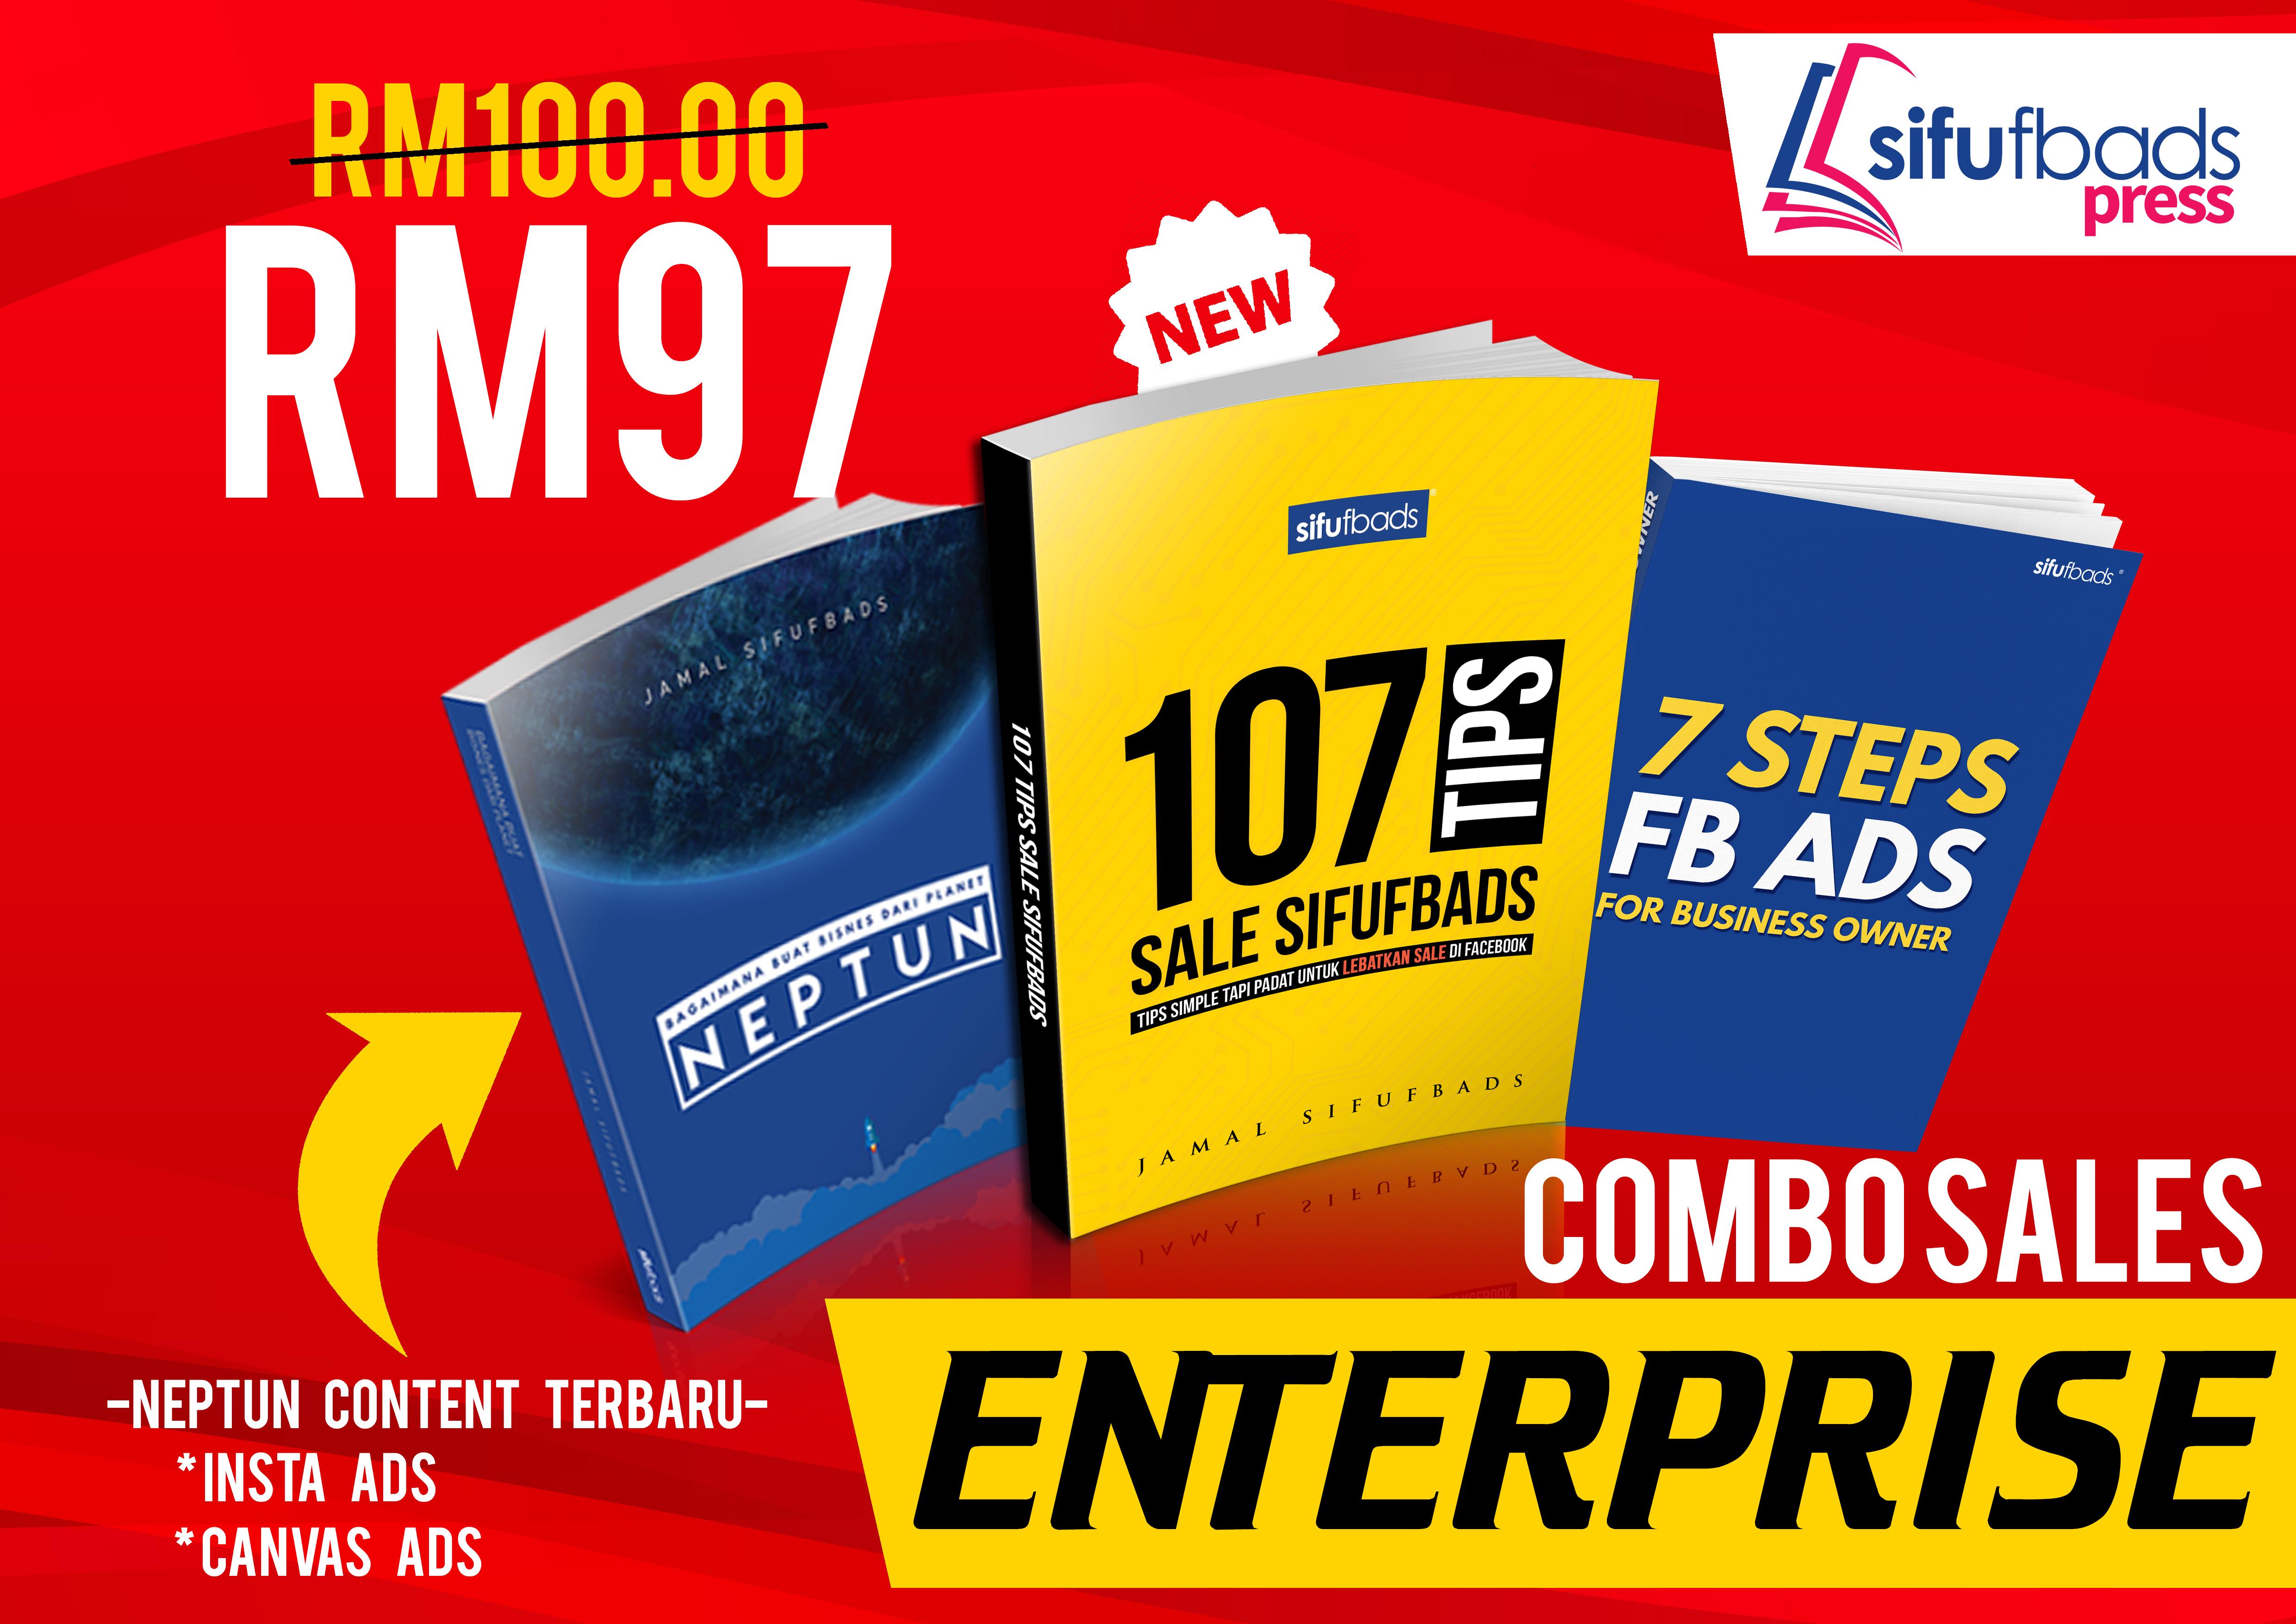 Enterprise RM97